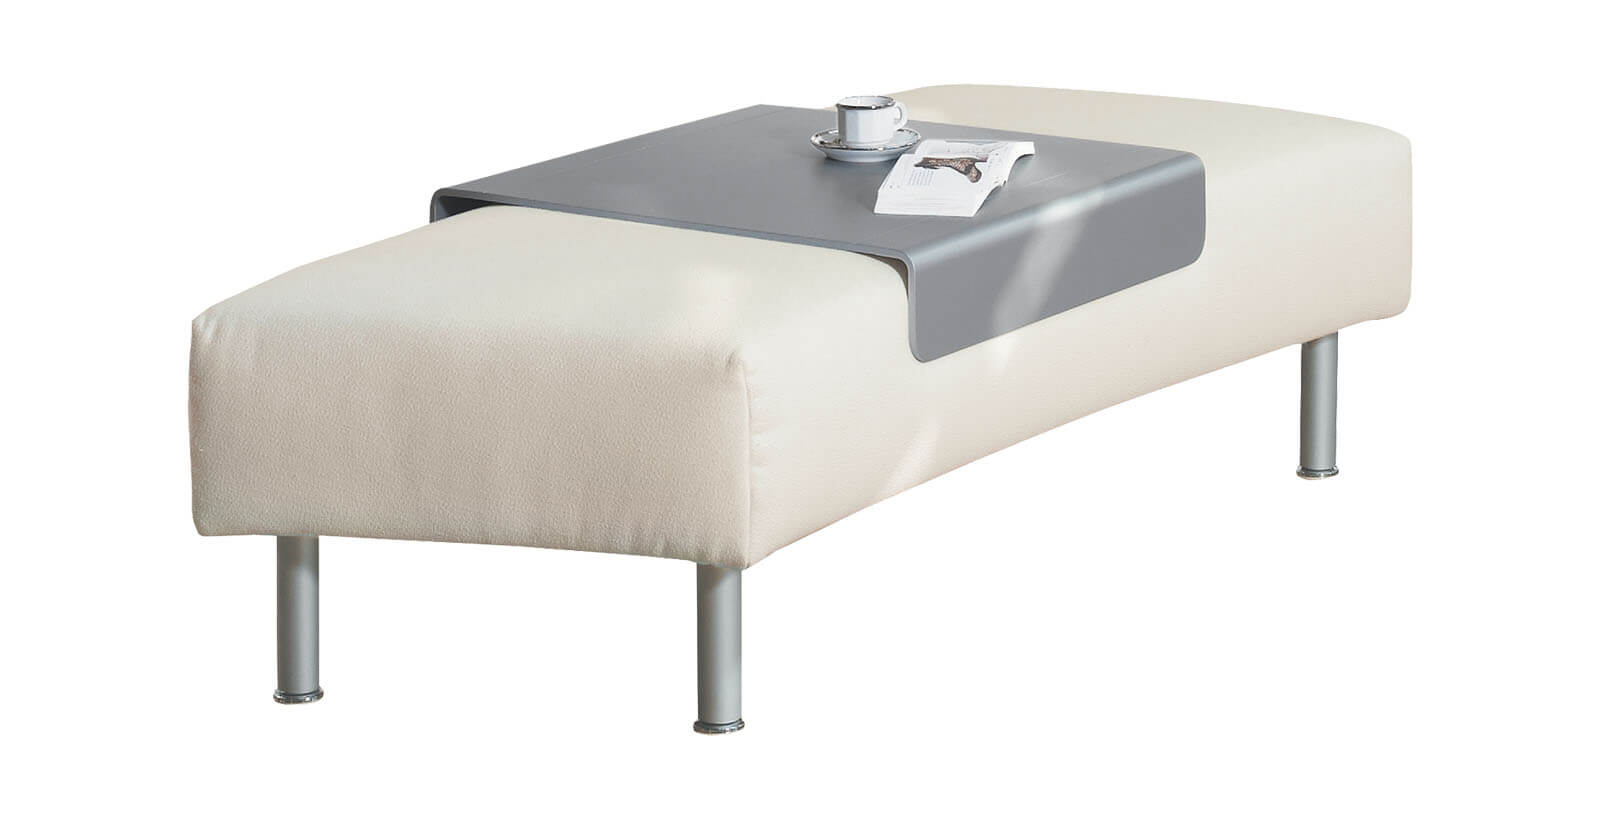 stool taipei by franz fertig. Black Bedroom Furniture Sets. Home Design Ideas